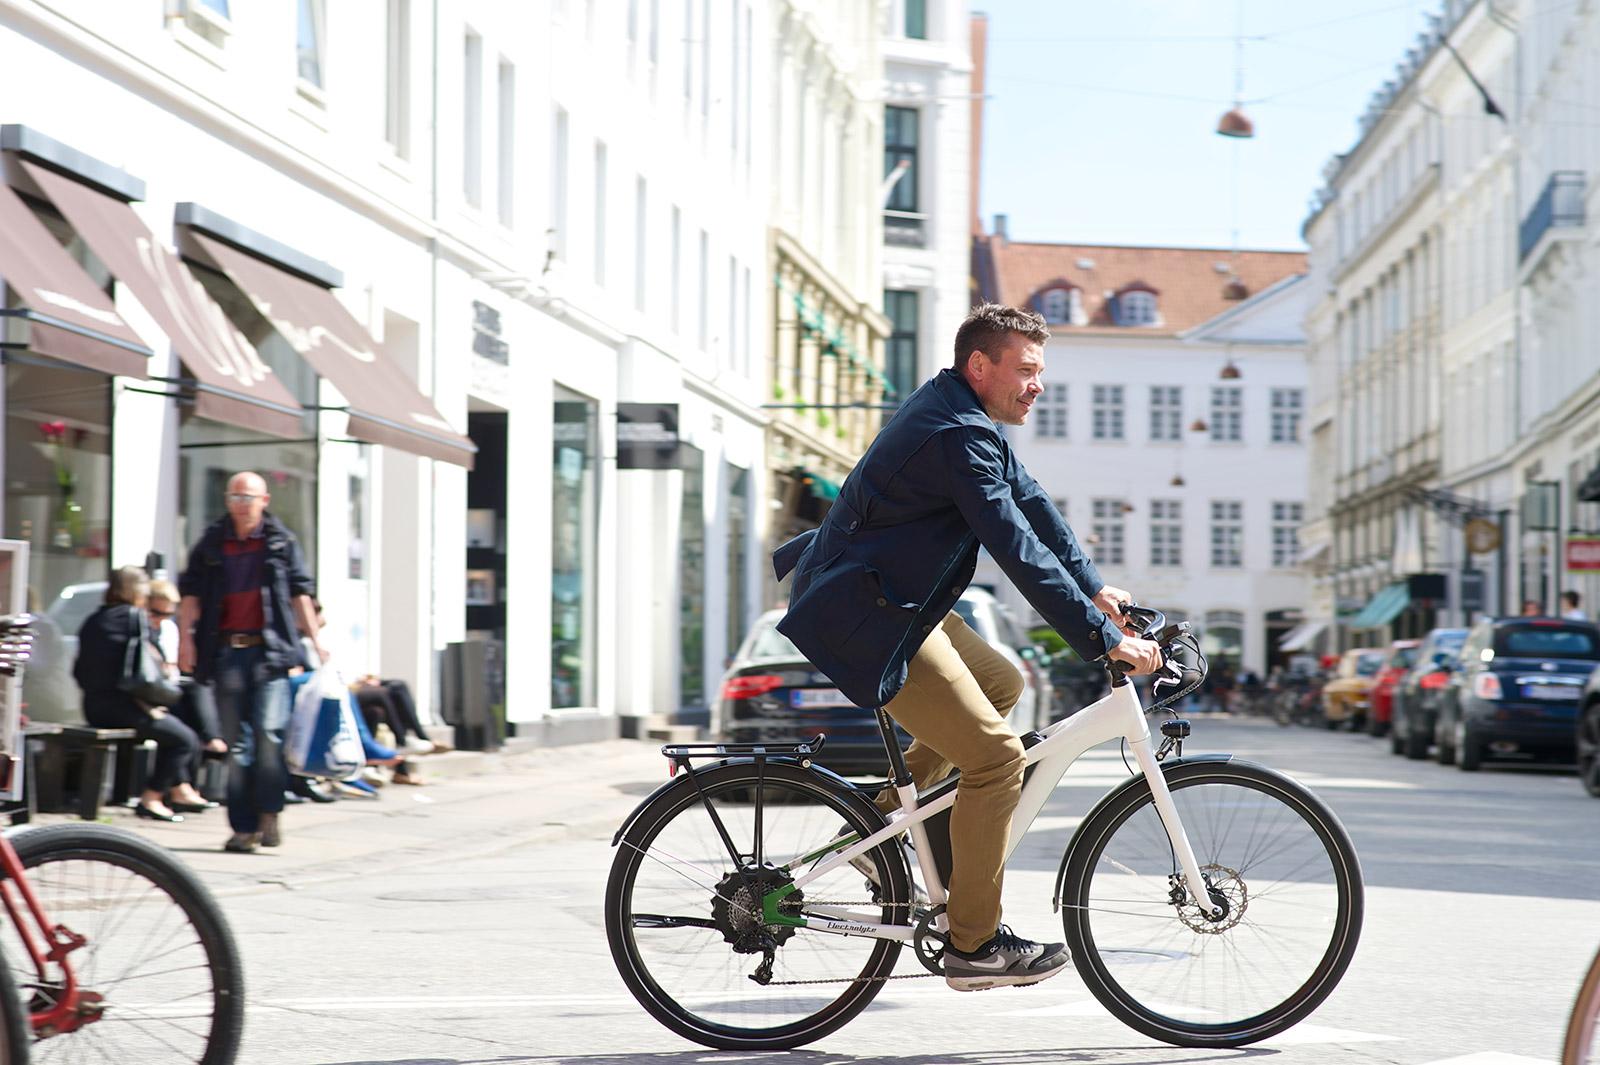 Vorradler unterwegs in Stockholm